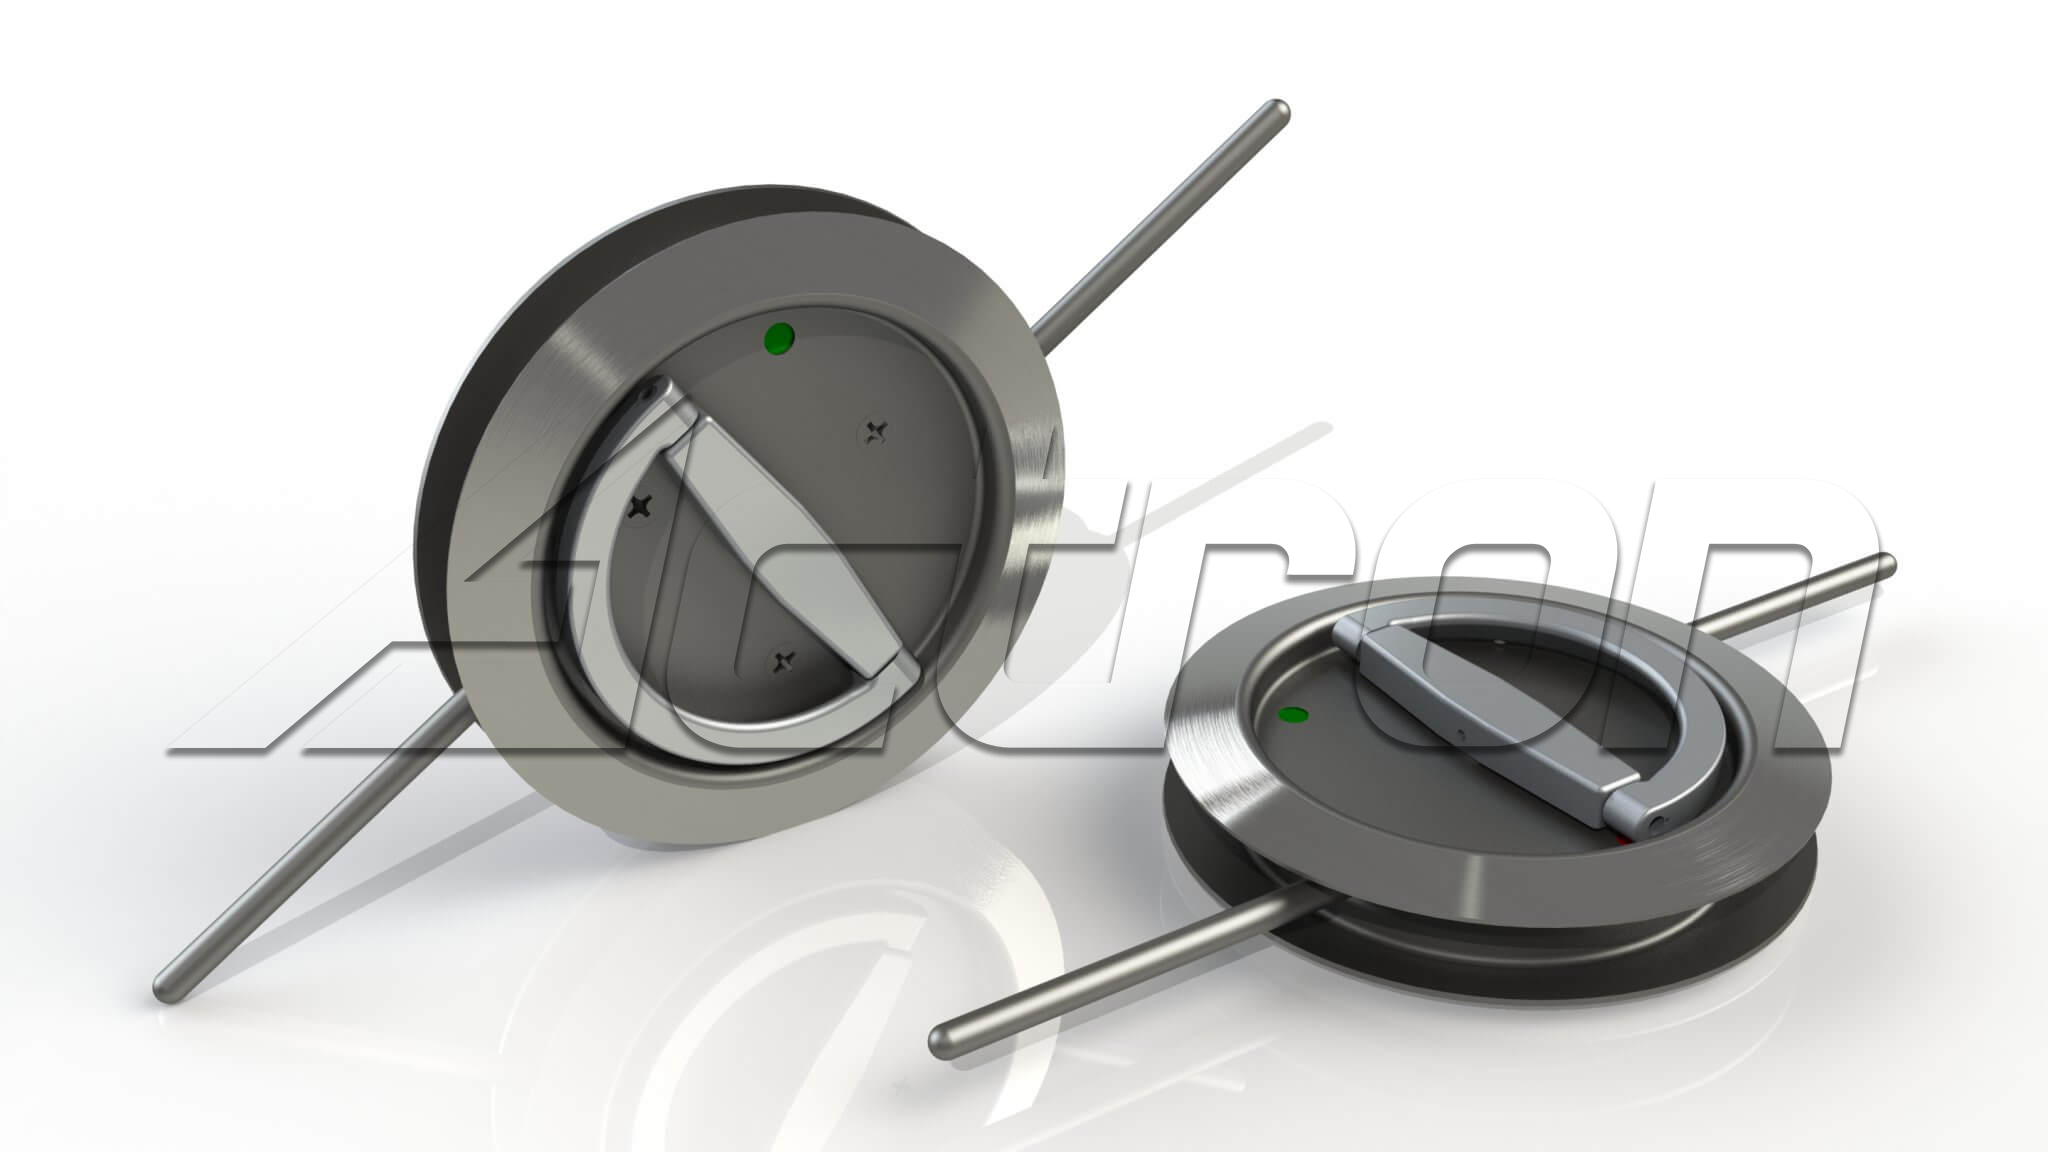 door-bolting-system-8211-d-handle-5485-a39139.jpg